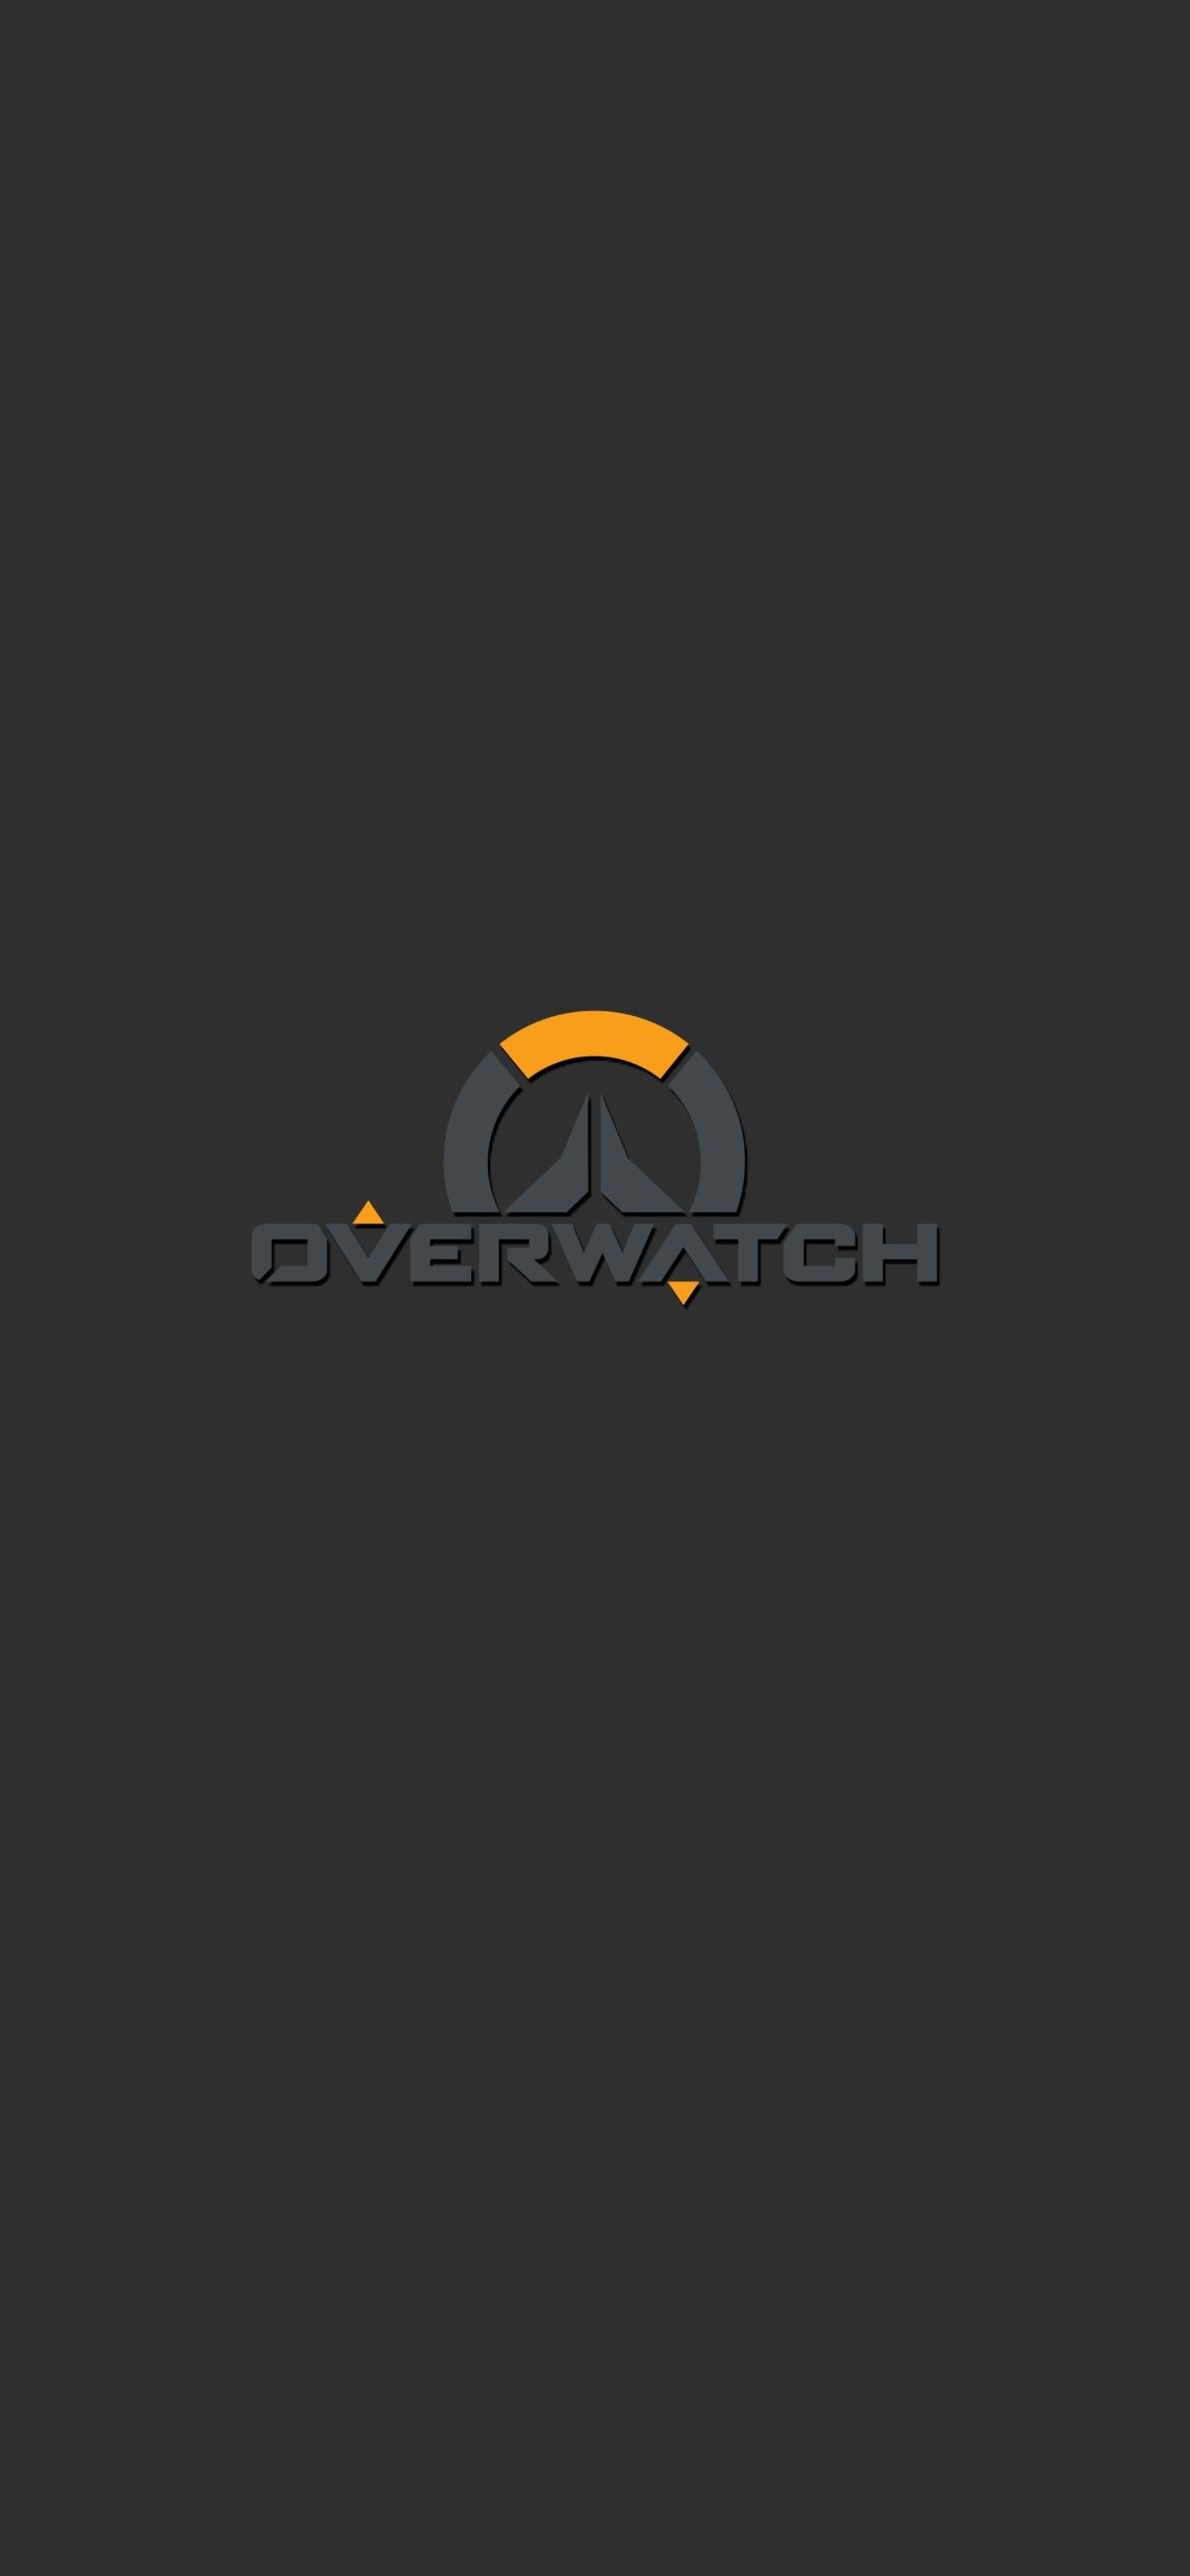 Overwatch Logo Wallpaper Mobile Wallpaper Overwatch Wallpapers Overwatch